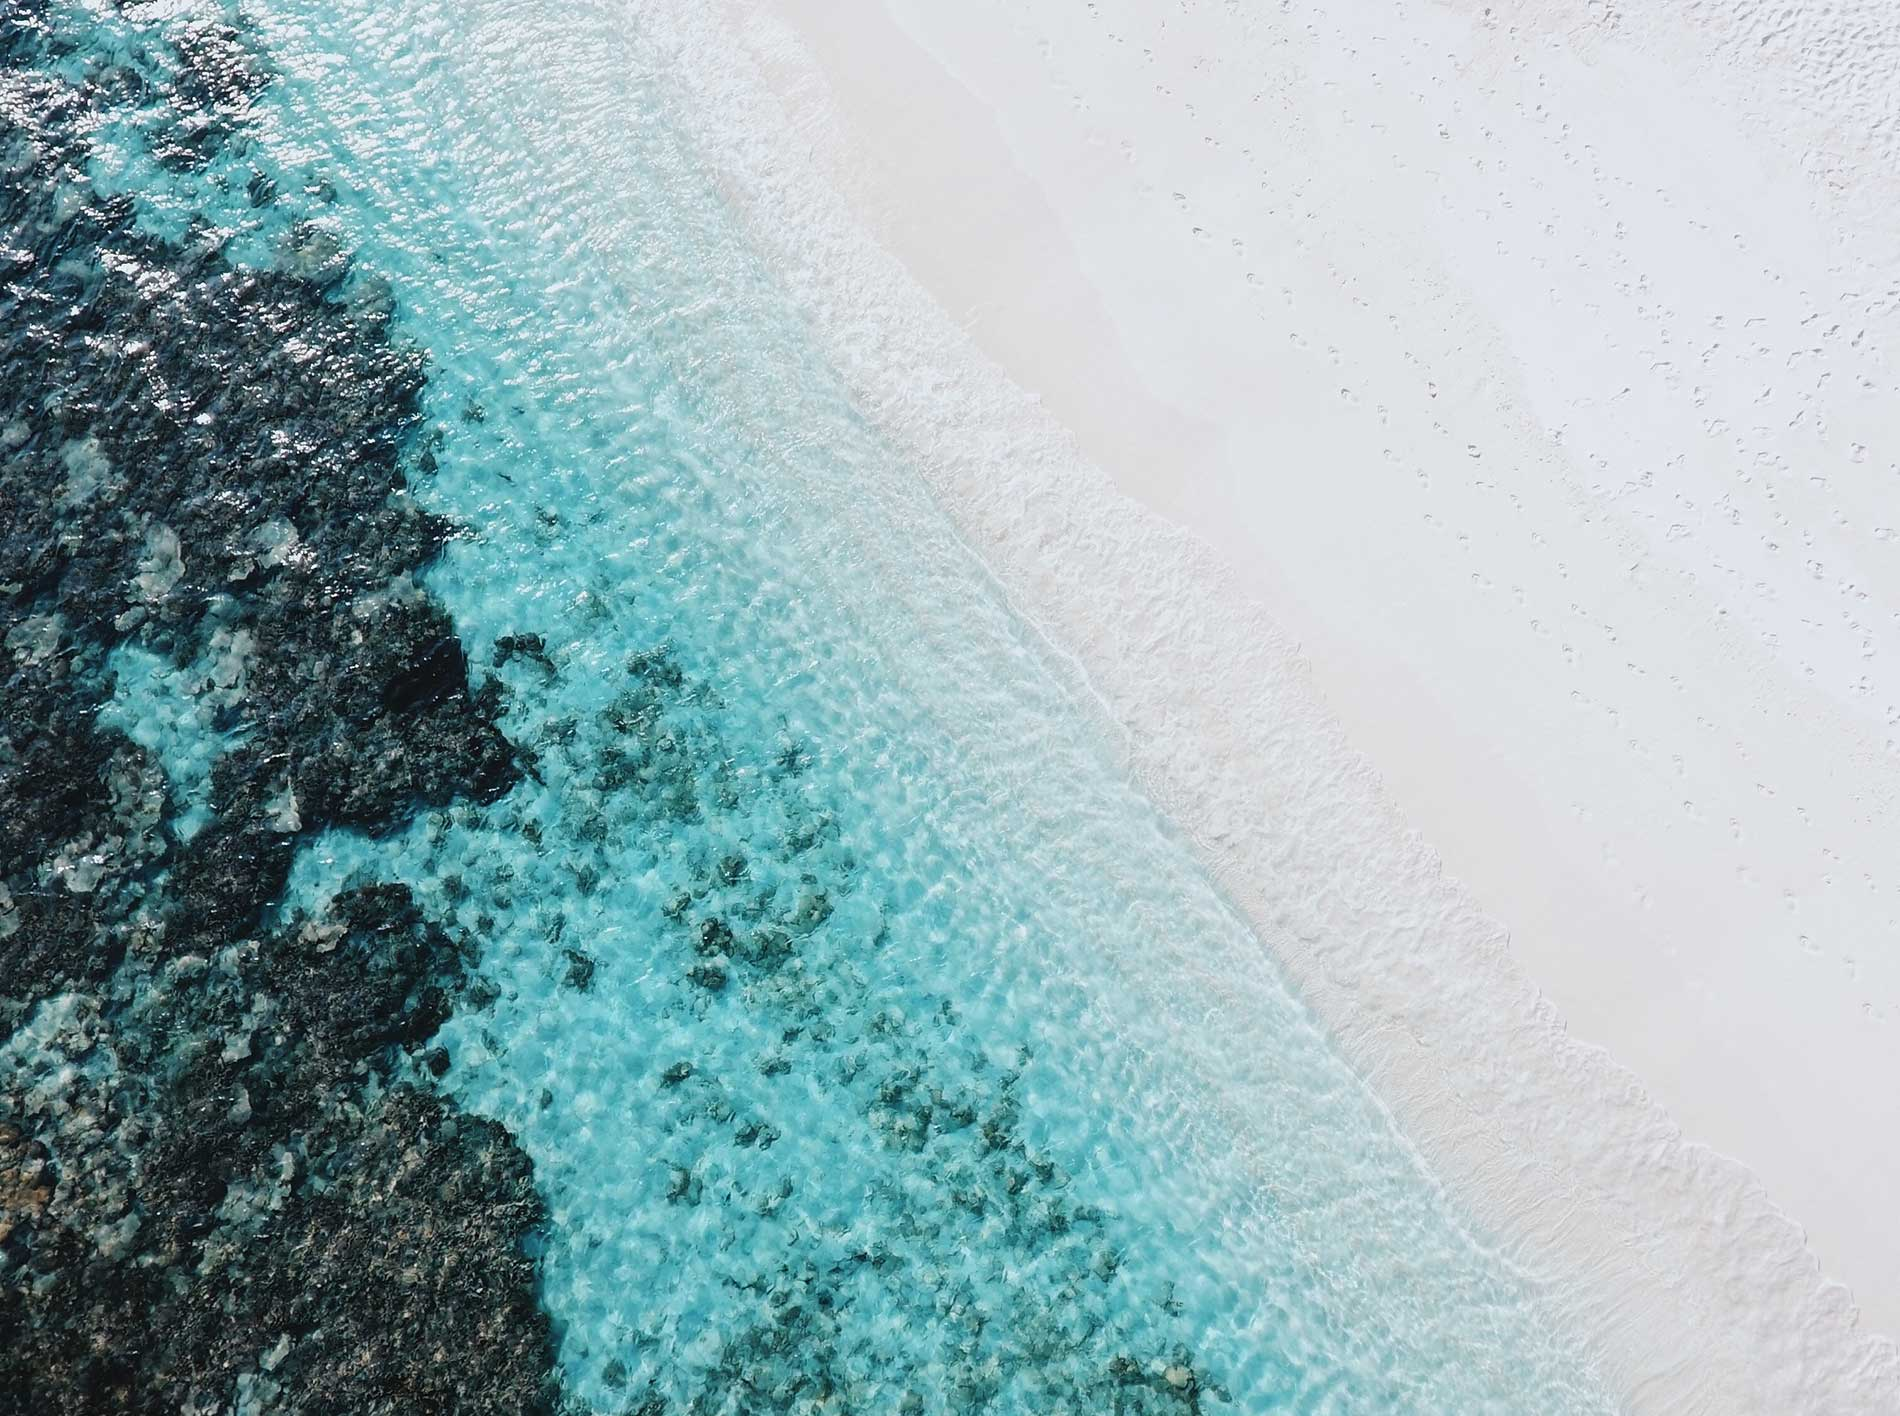 Hipotels beach